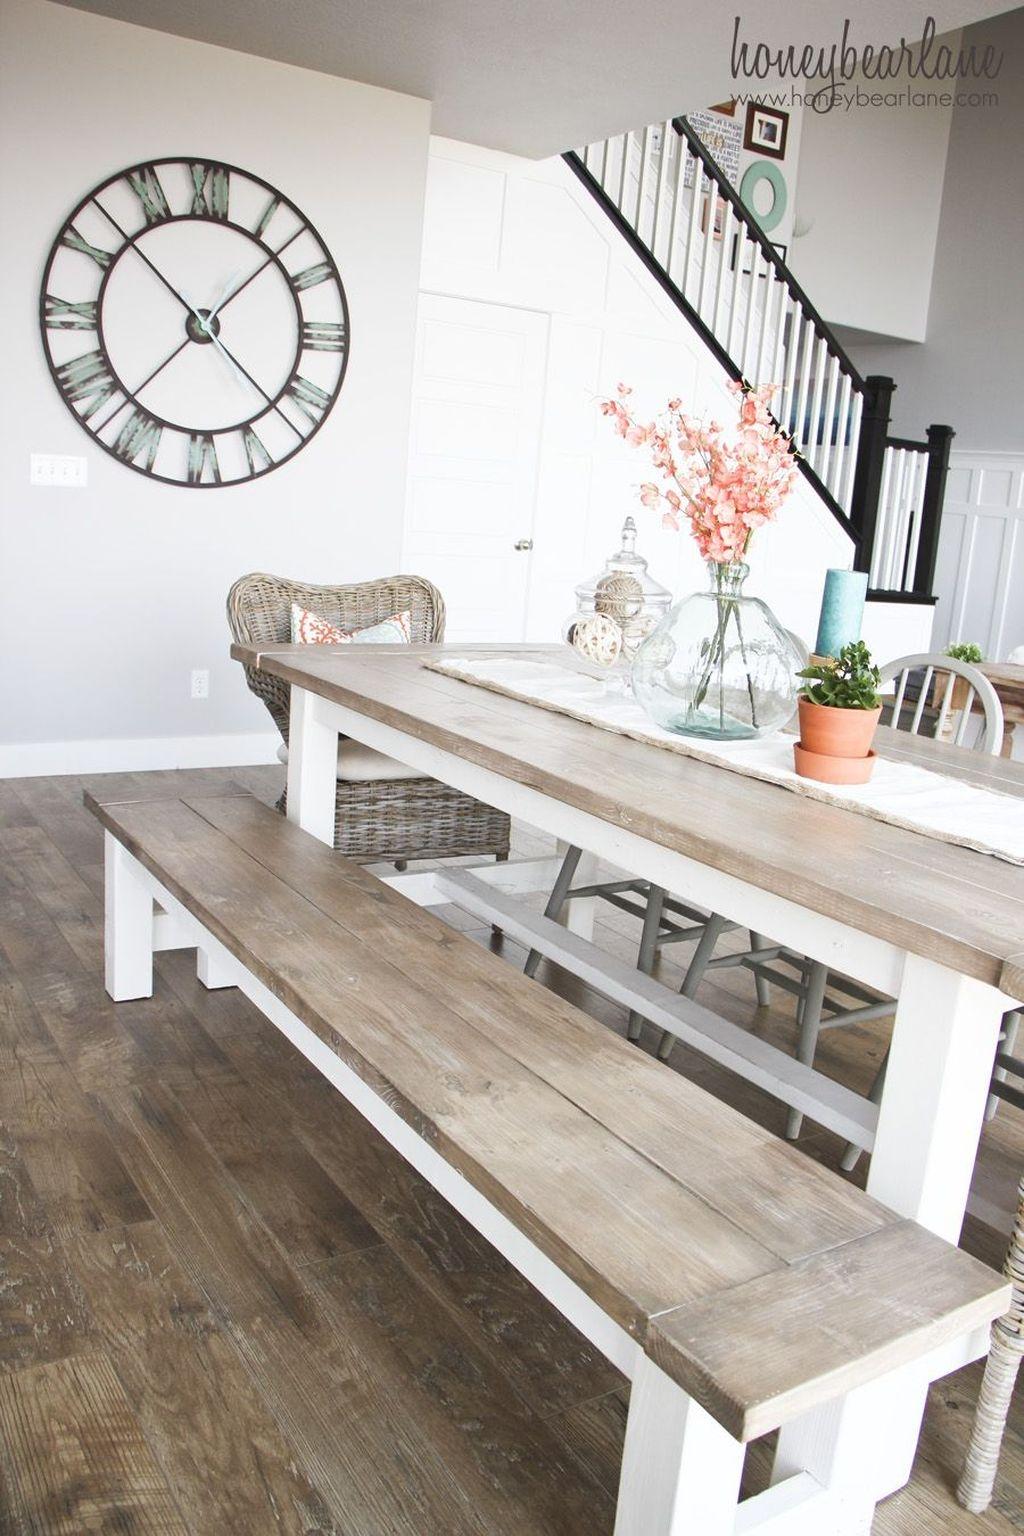 Amazing Diy Farmhouse Home Decor Ideas On A Budget 36